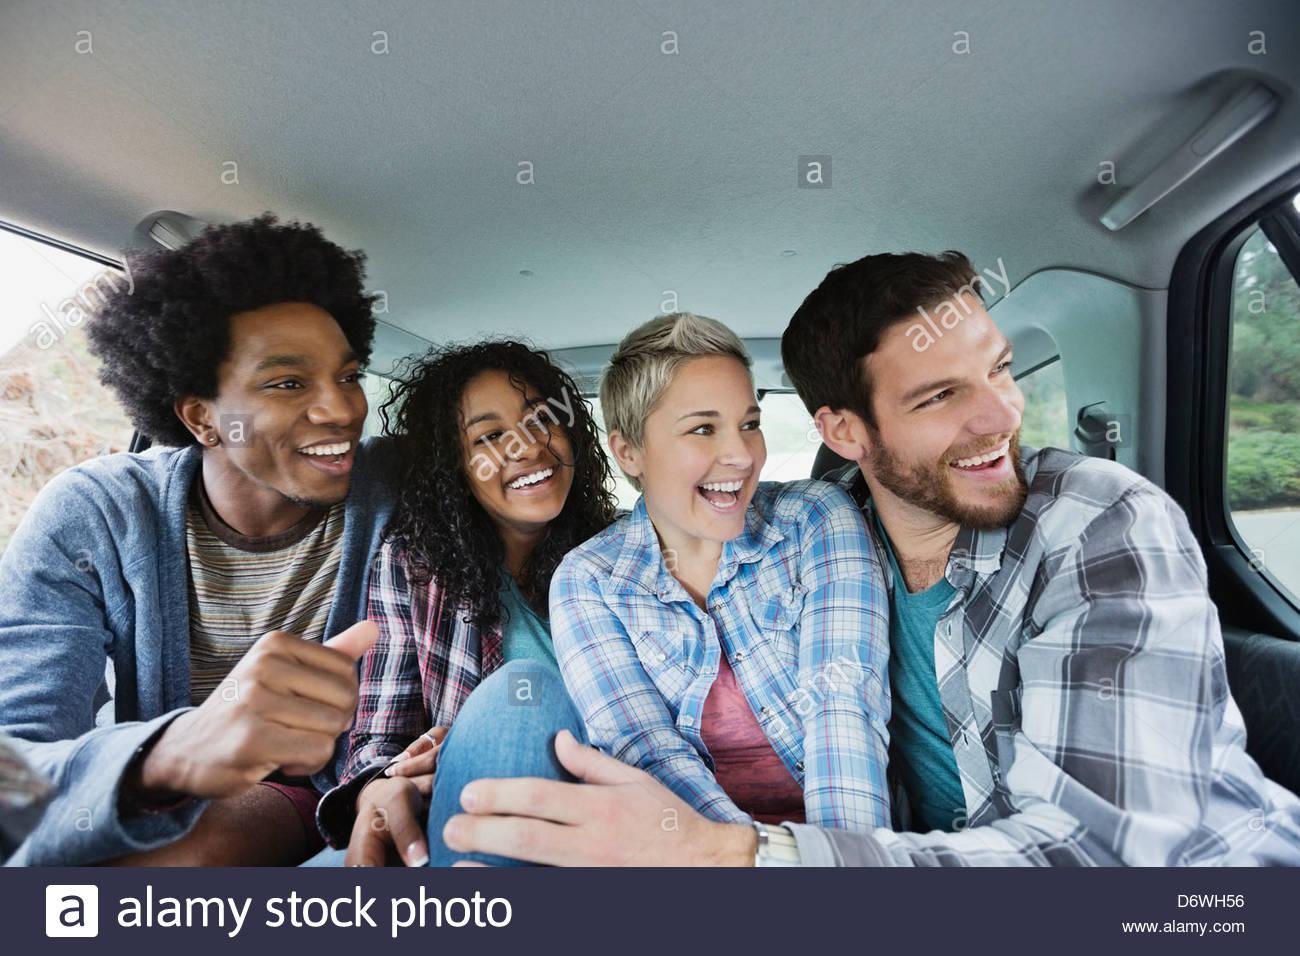 Cheerful friends enjoying road trip Photo Stock